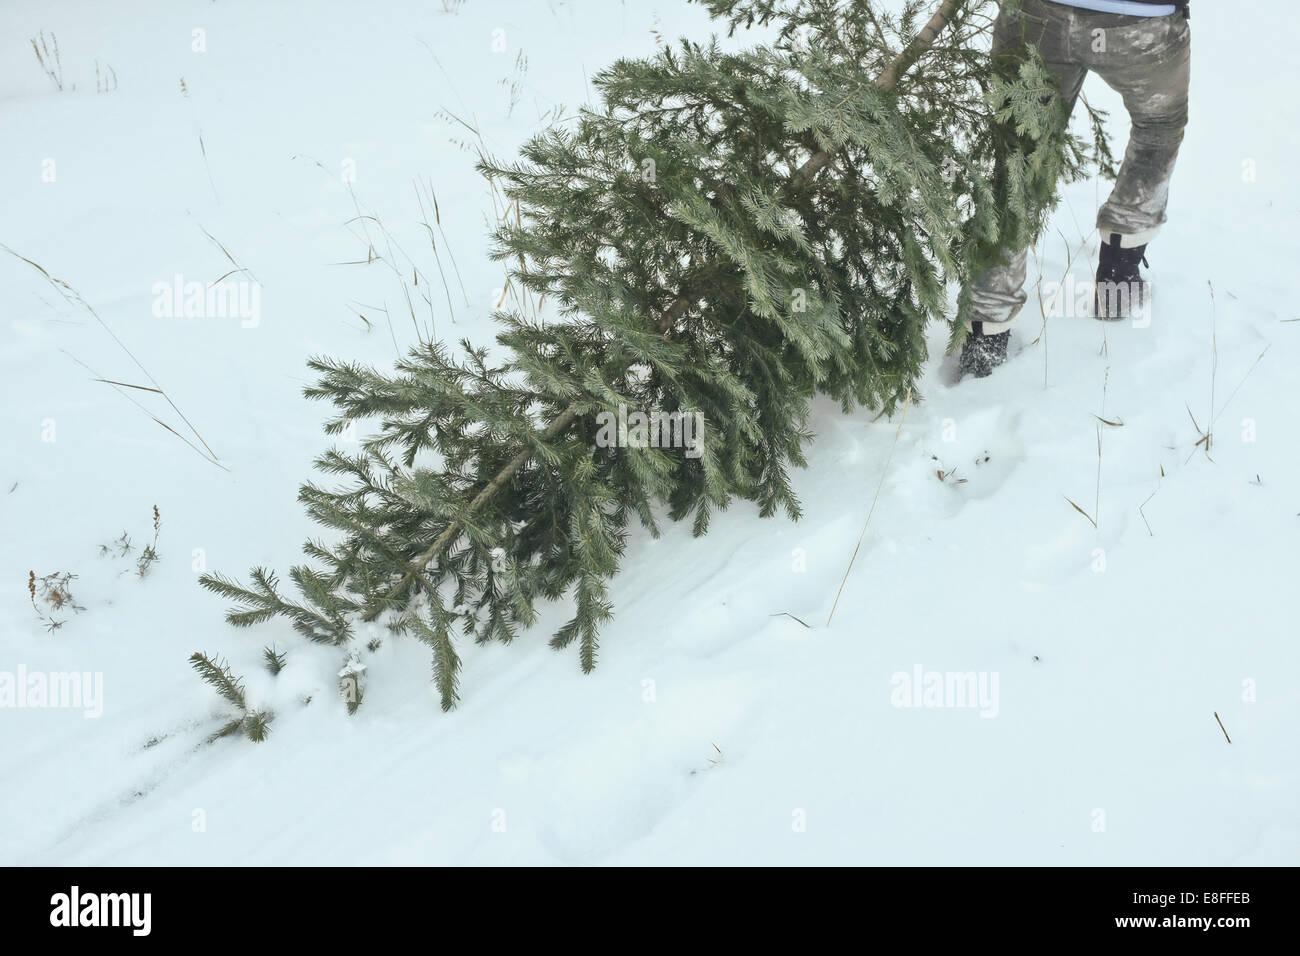 Tree dragged through snow by man - Stock Image